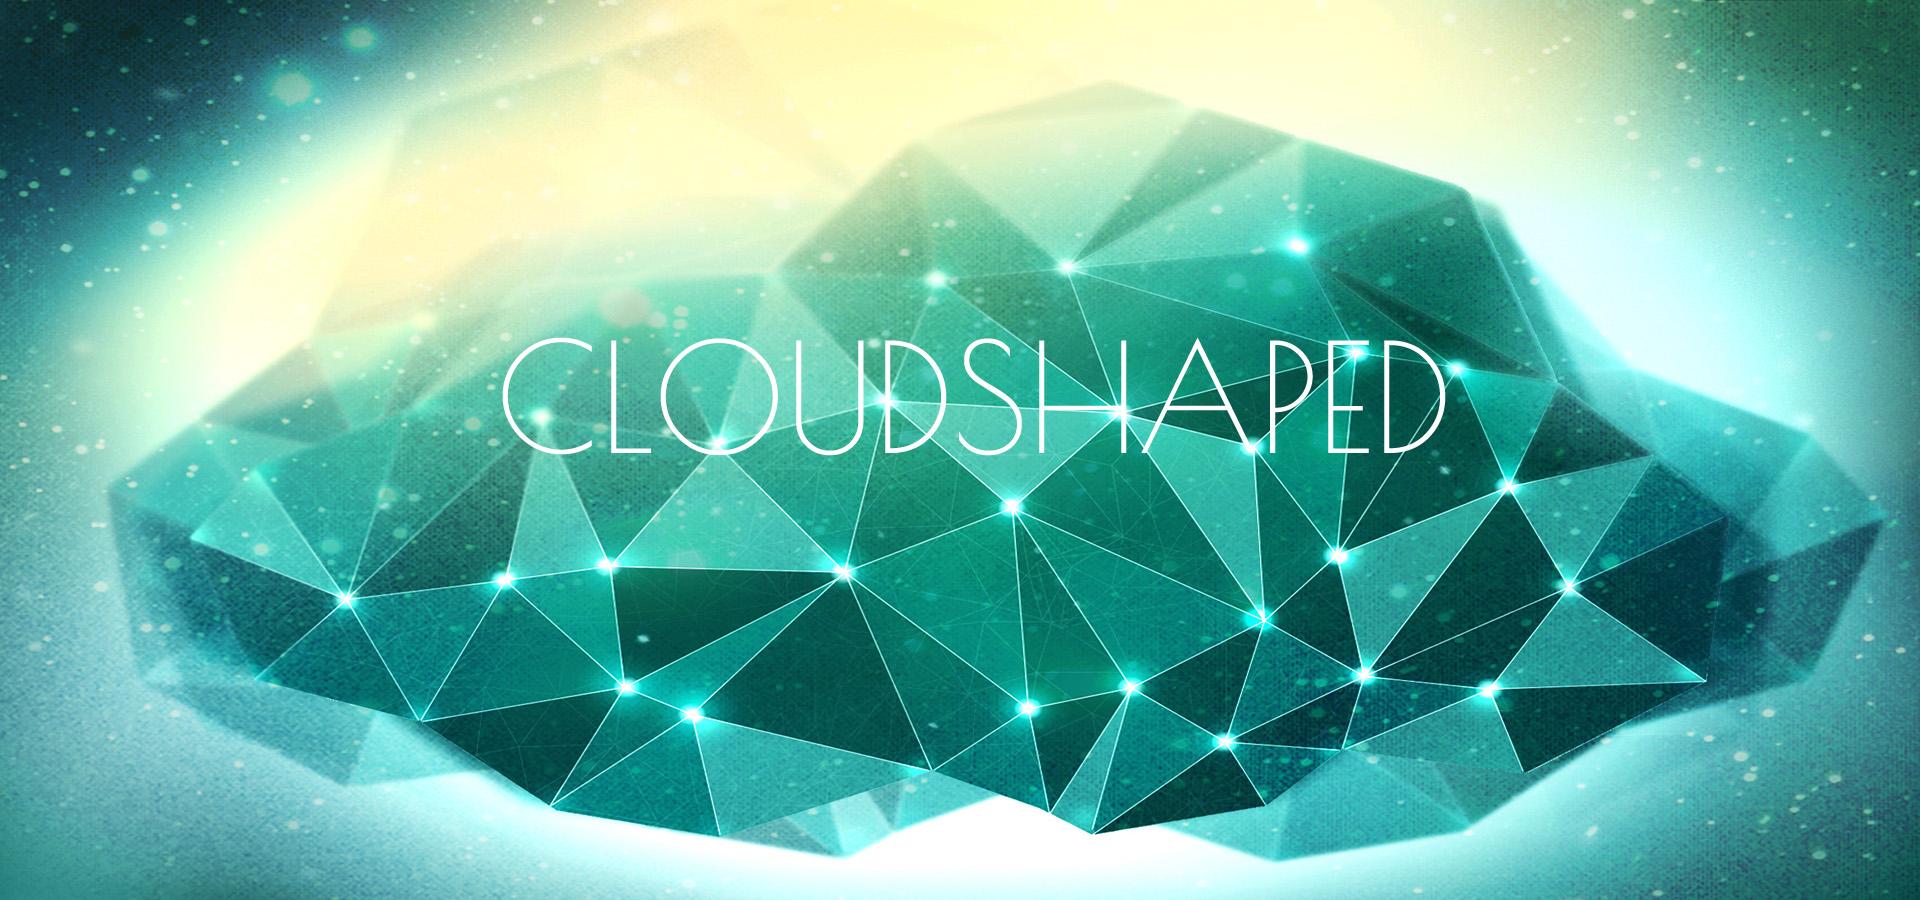 Cloudshaped